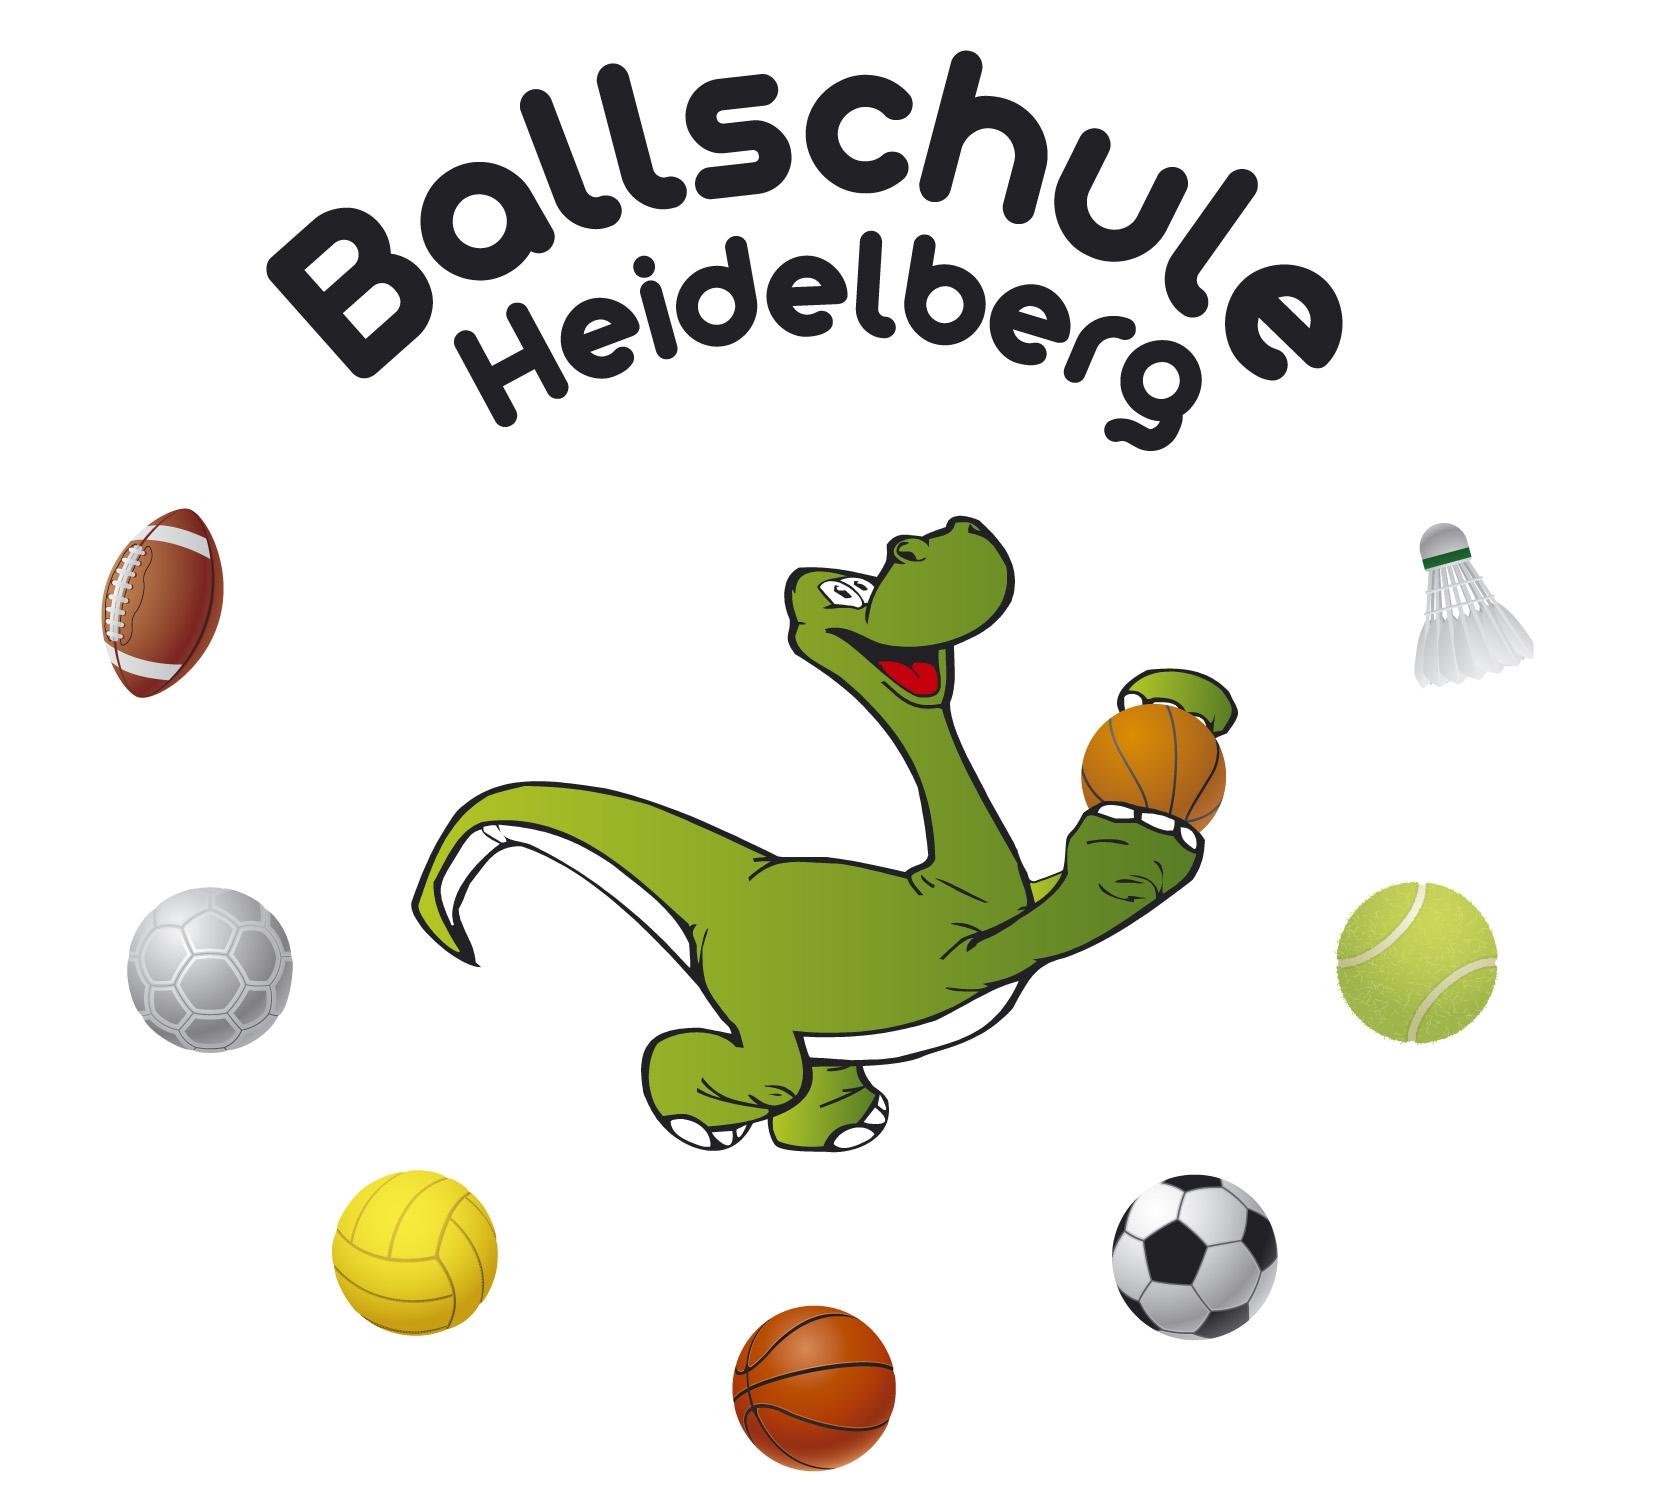 http://www.sportagentur-hummel.de/wp-content/uploads/2012/02/Ballschule_Heidelberg_Logo_2010.jpg